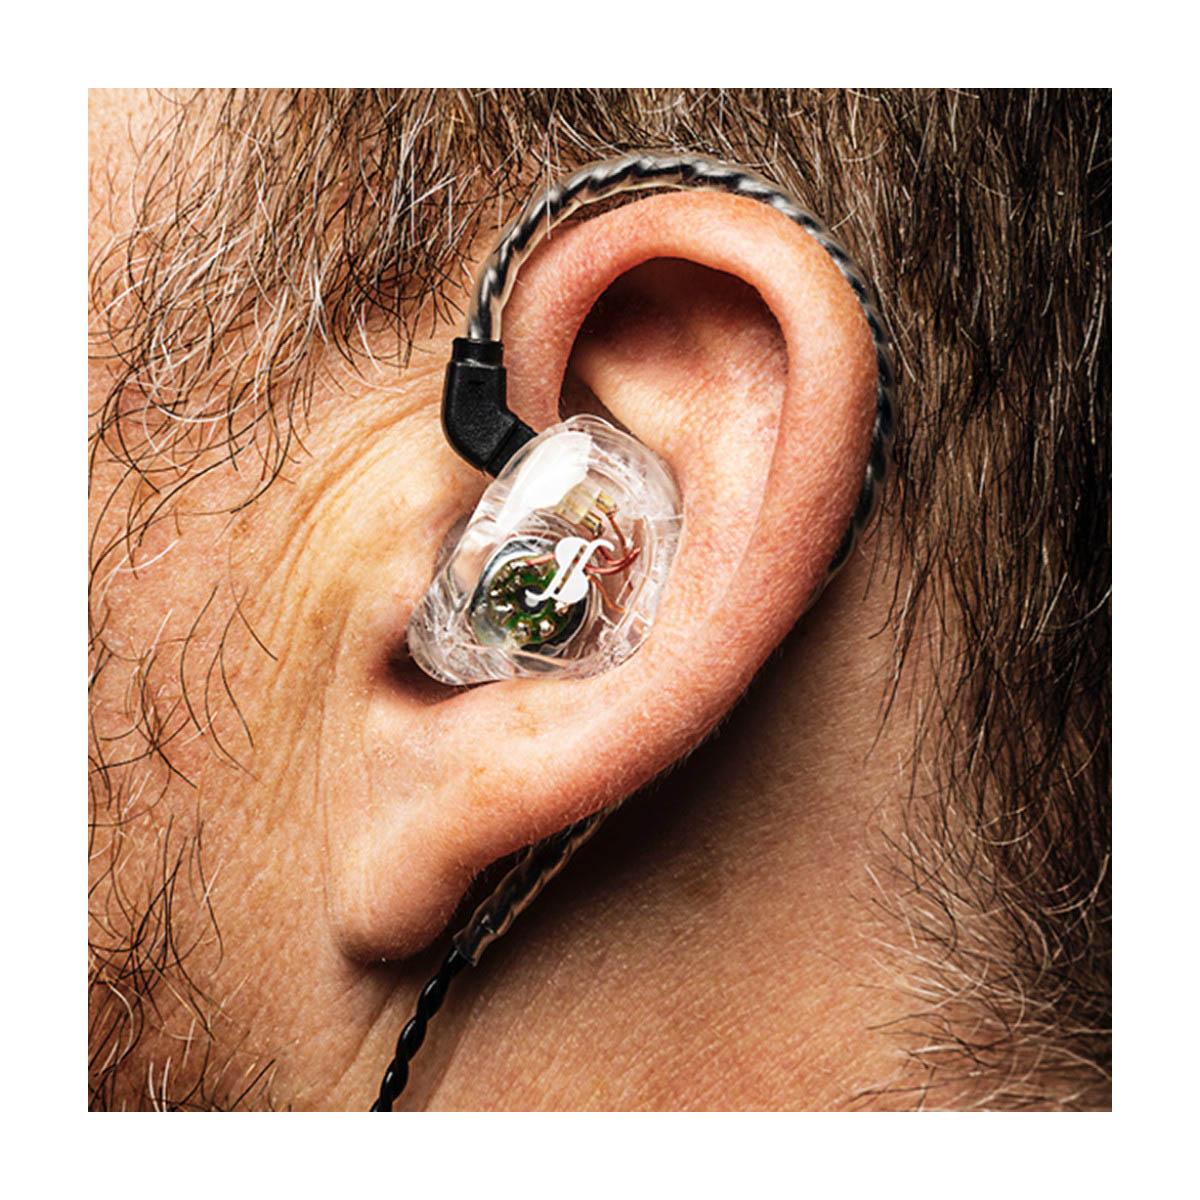 Fone In-Ear Transparente 2 Microdriver 108 dB  STAGG SPM-235